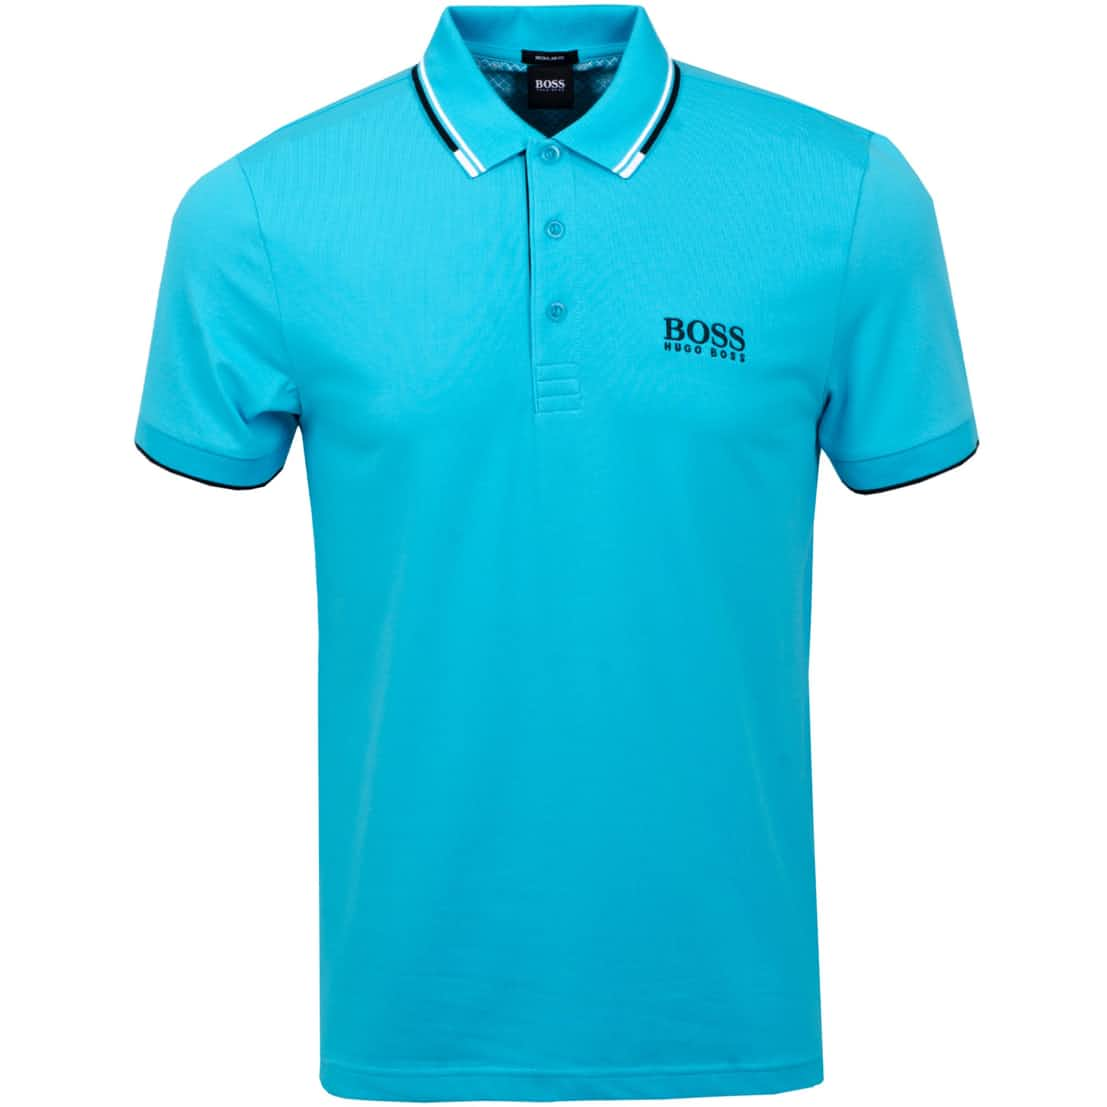 Hugo Boss Golf Paddy Pro Bright Blue